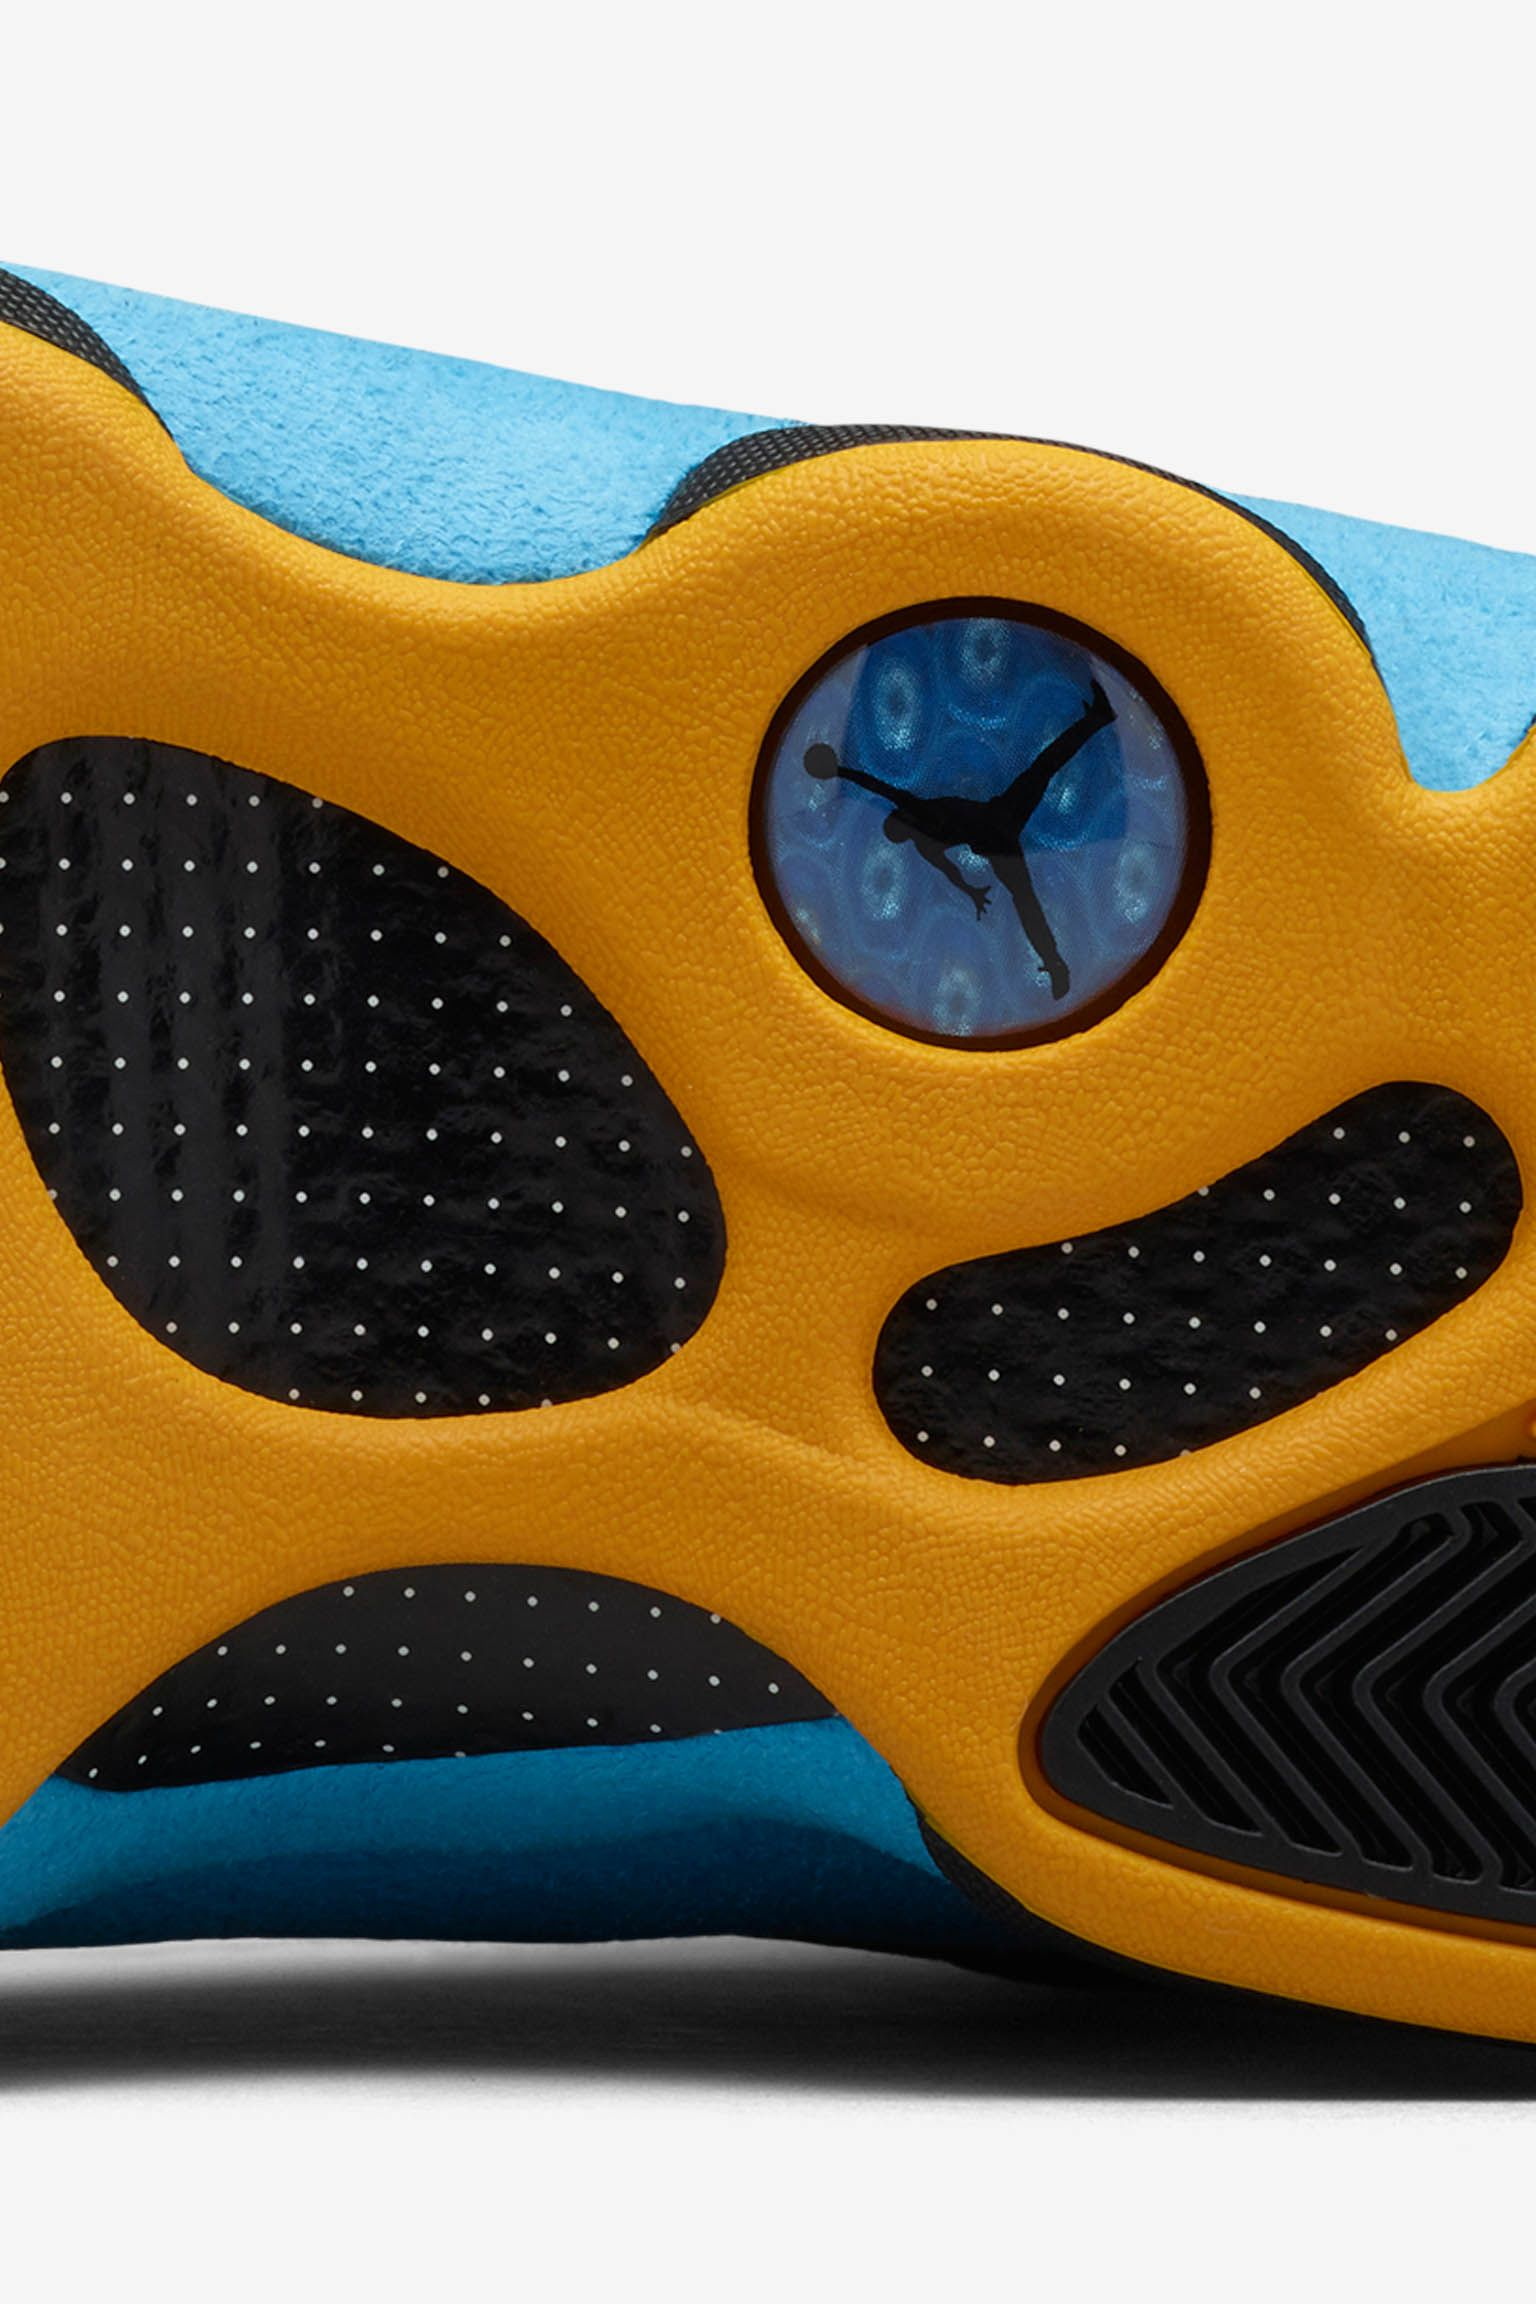 Air Jordan 13 Retro 'CP3' Release Date